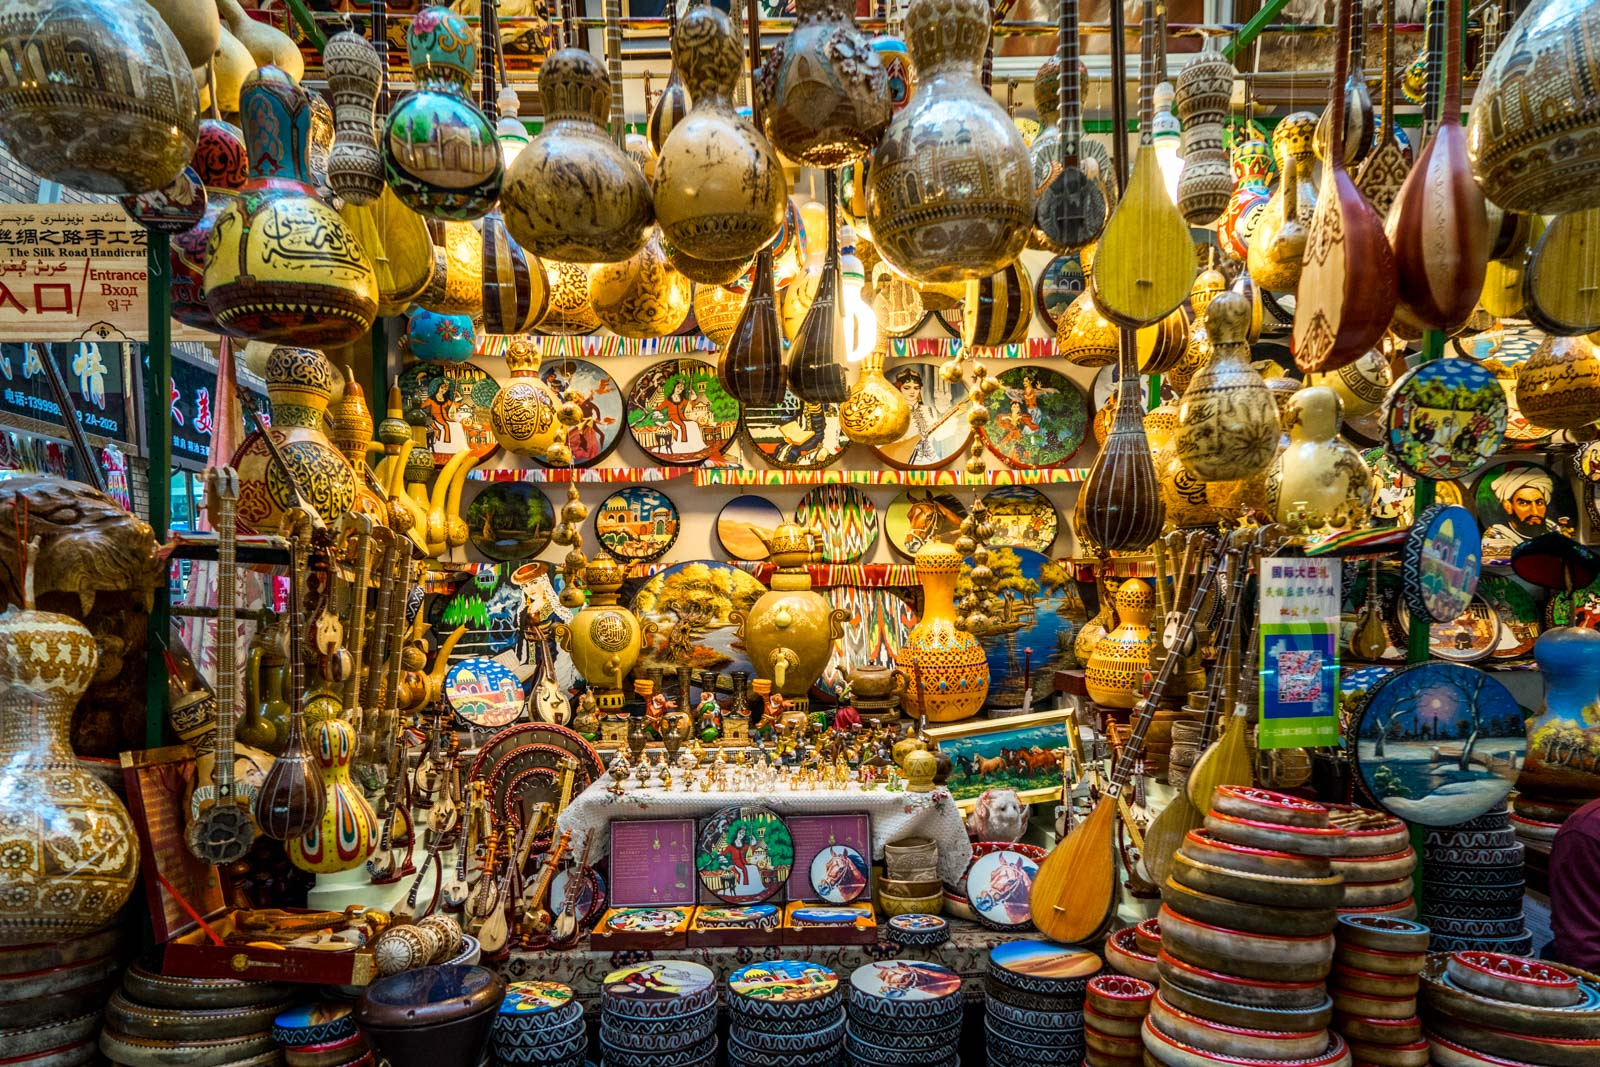 Urumqi Grand Bazaar, China